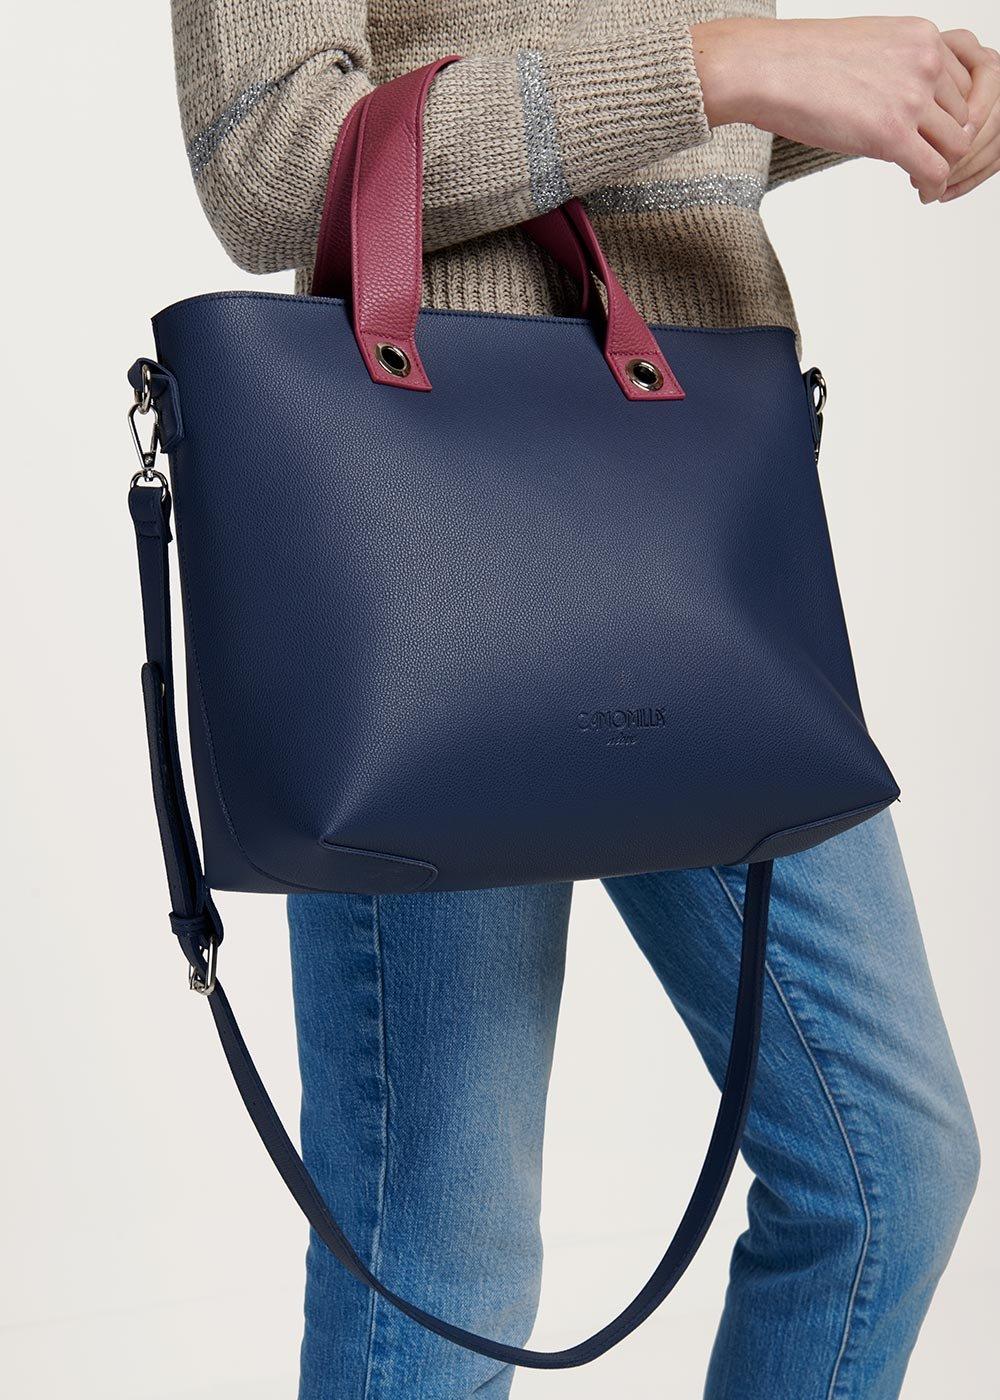 Bessie two-tone shopping bag - Marina / Dalia - Woman